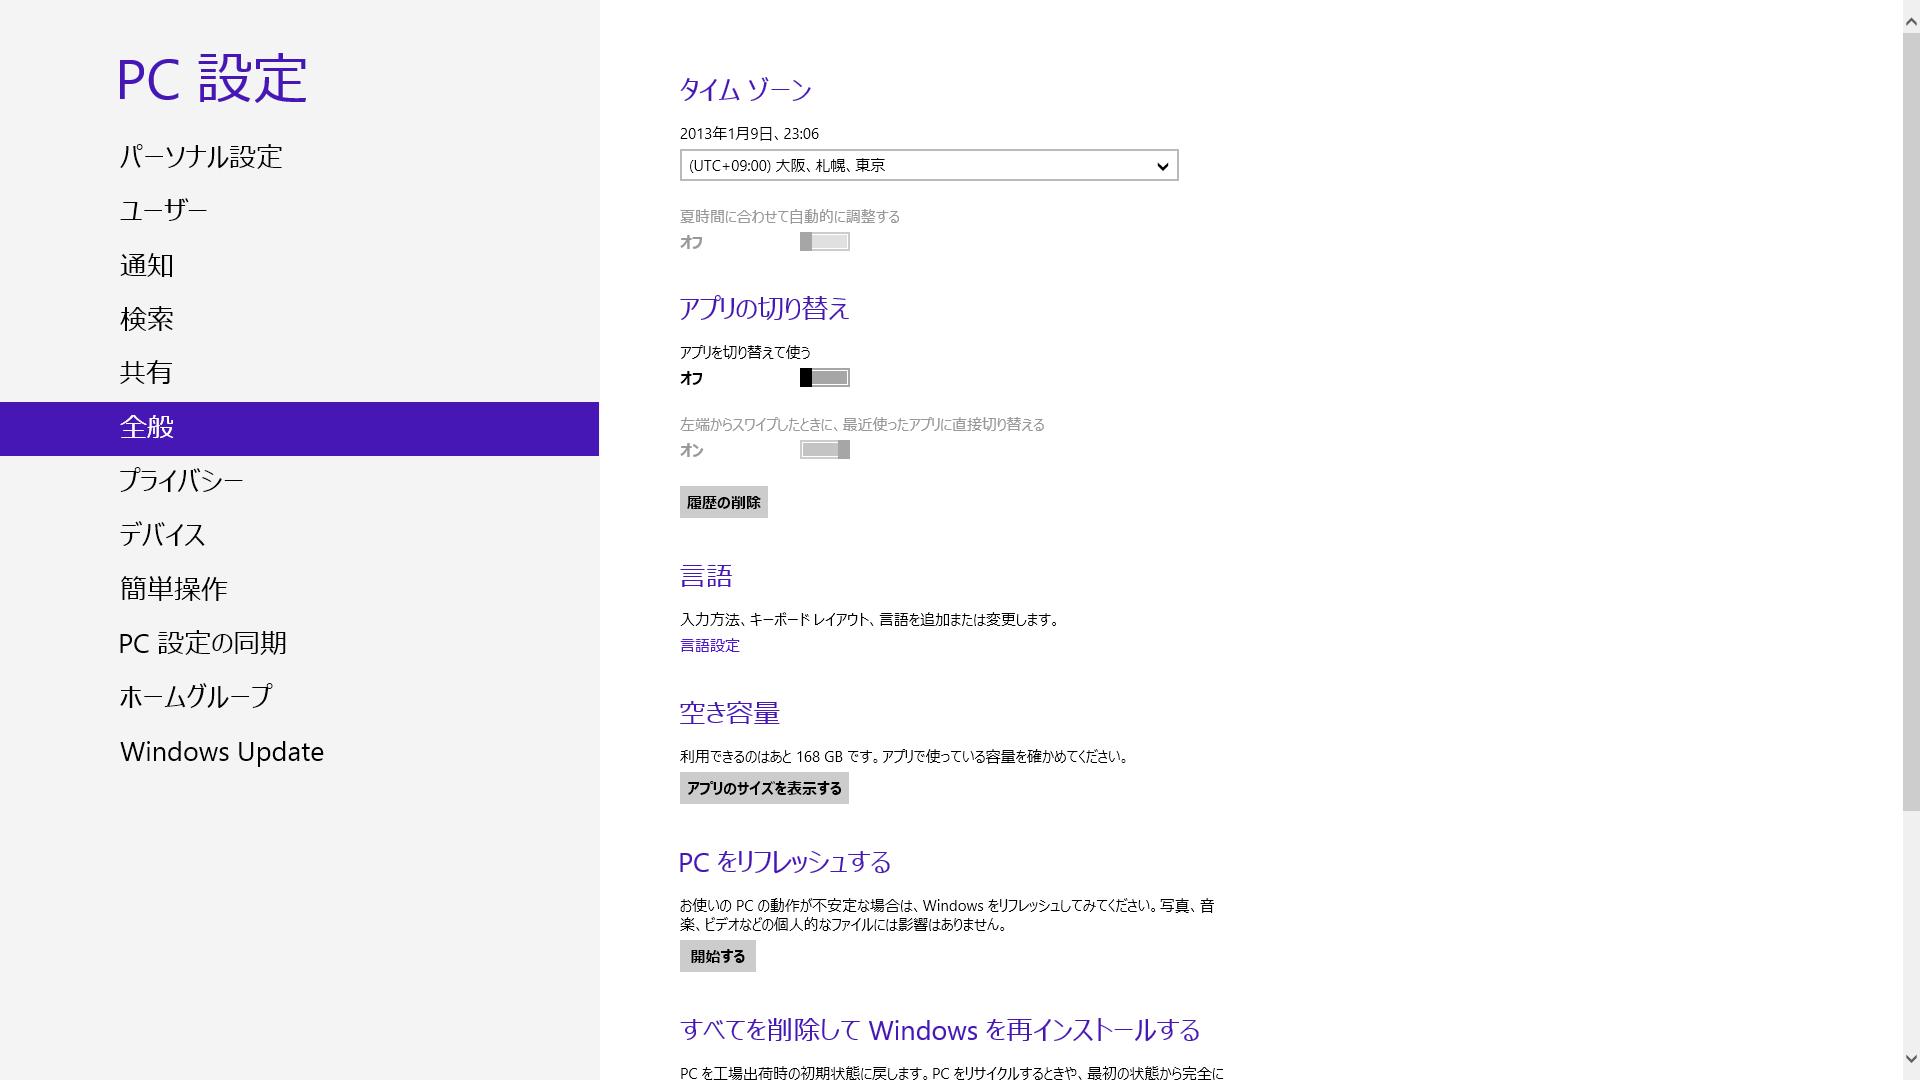 Windows8 プライバシーユーザー設定削除k